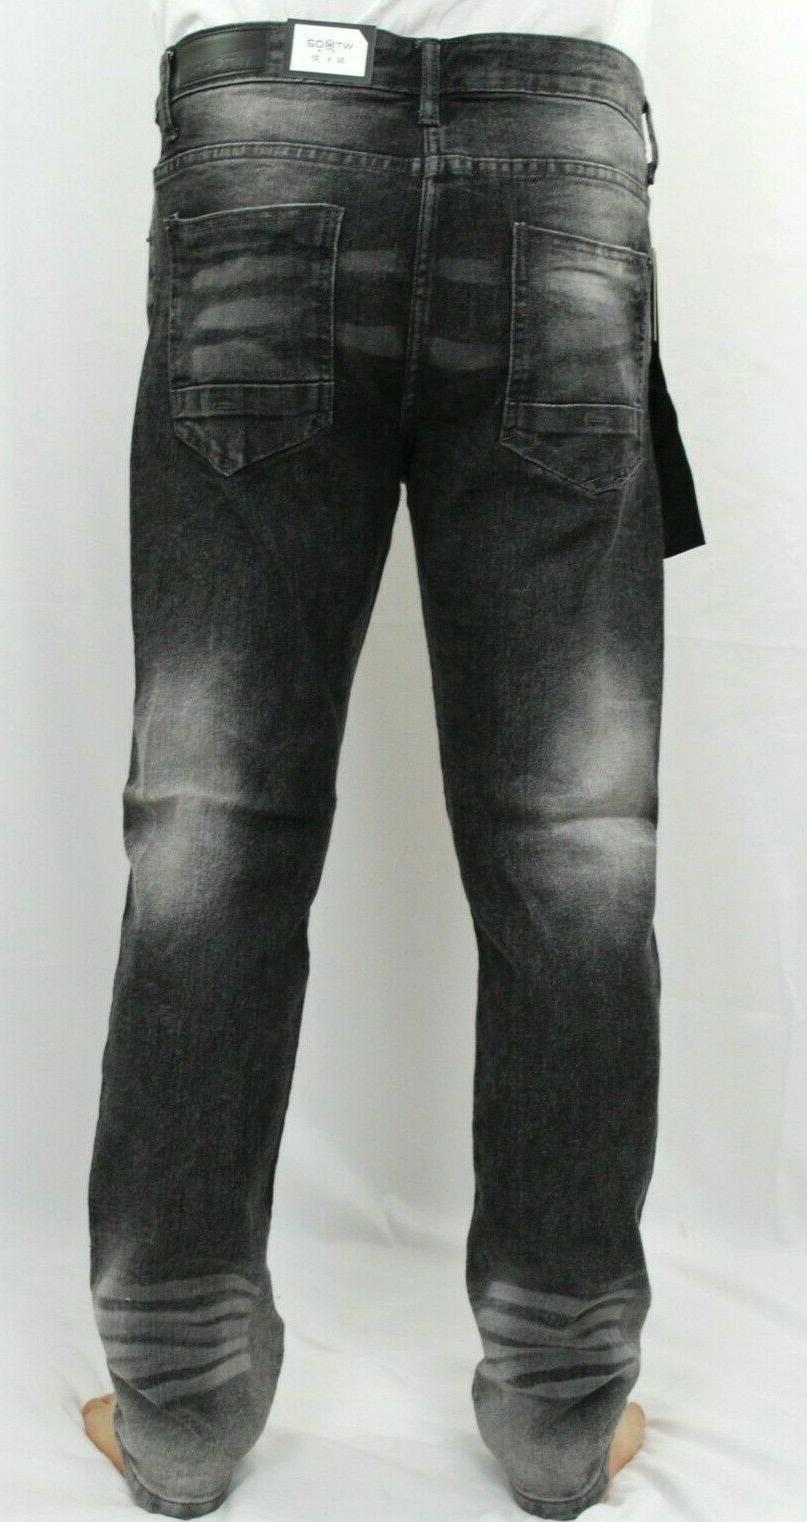 WT02 Skinny Jeans Distressed